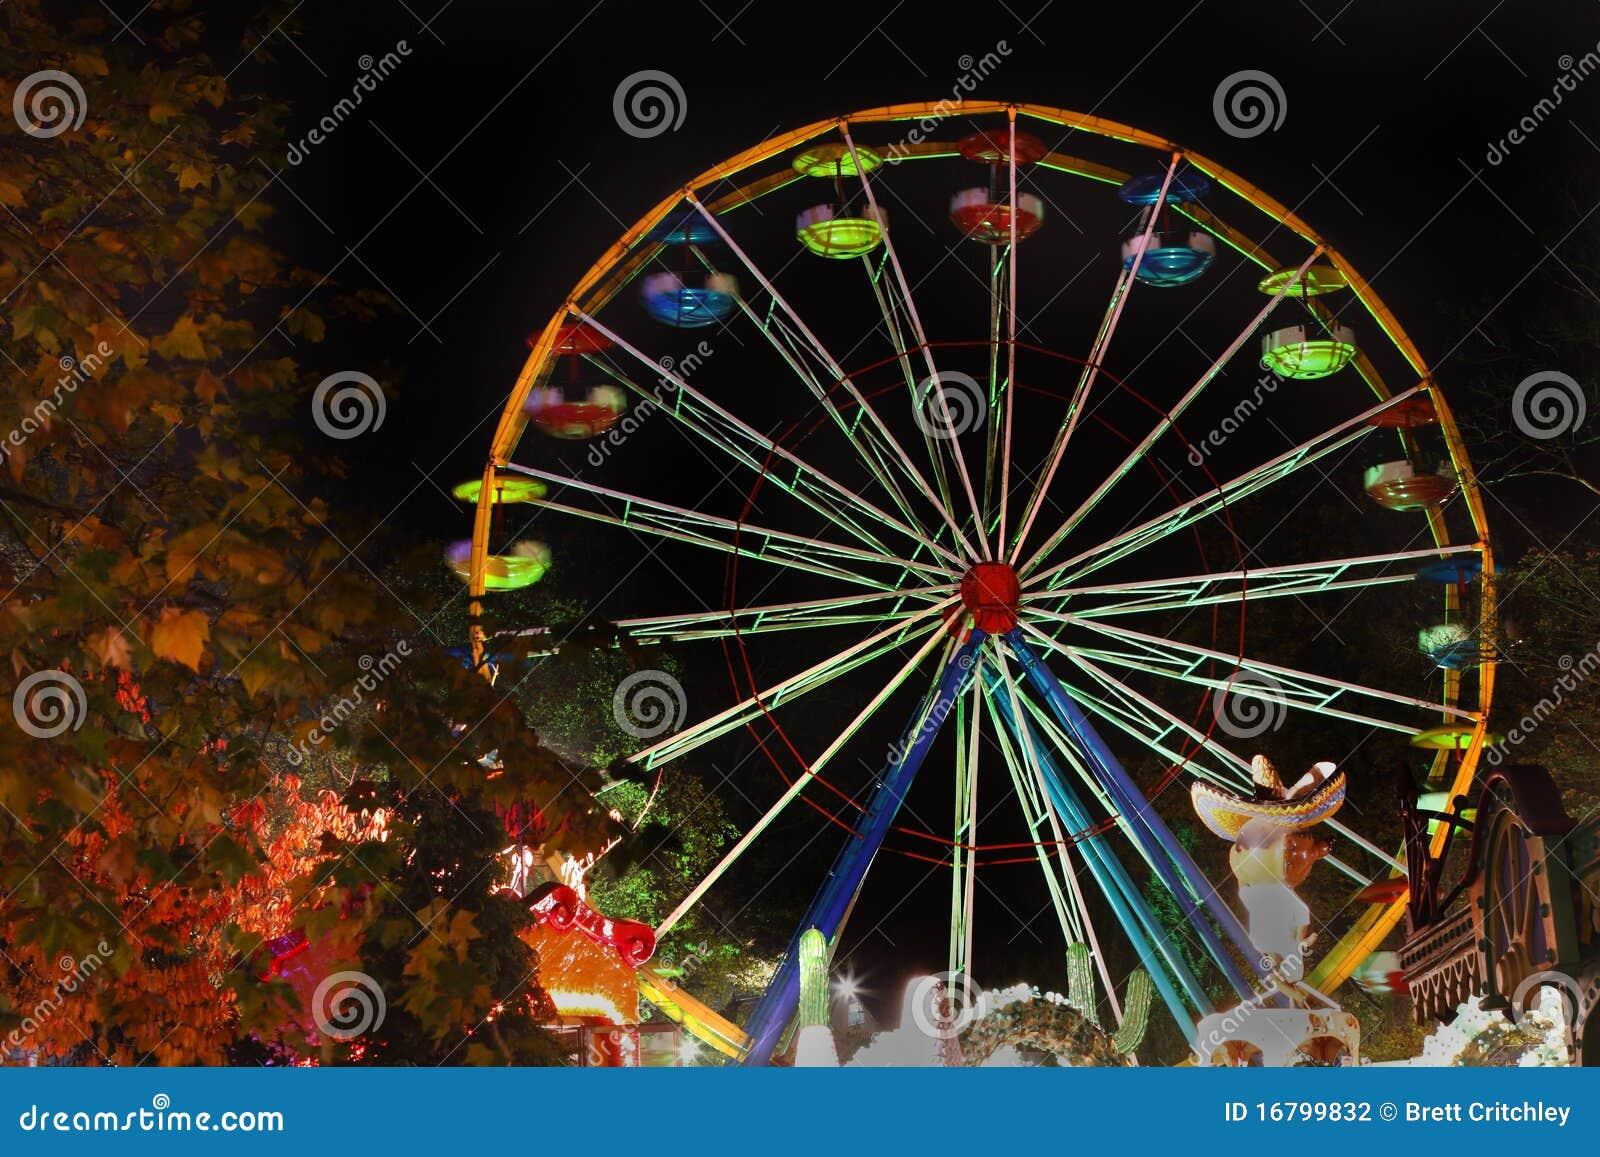 Funfair Ferris wheel at night